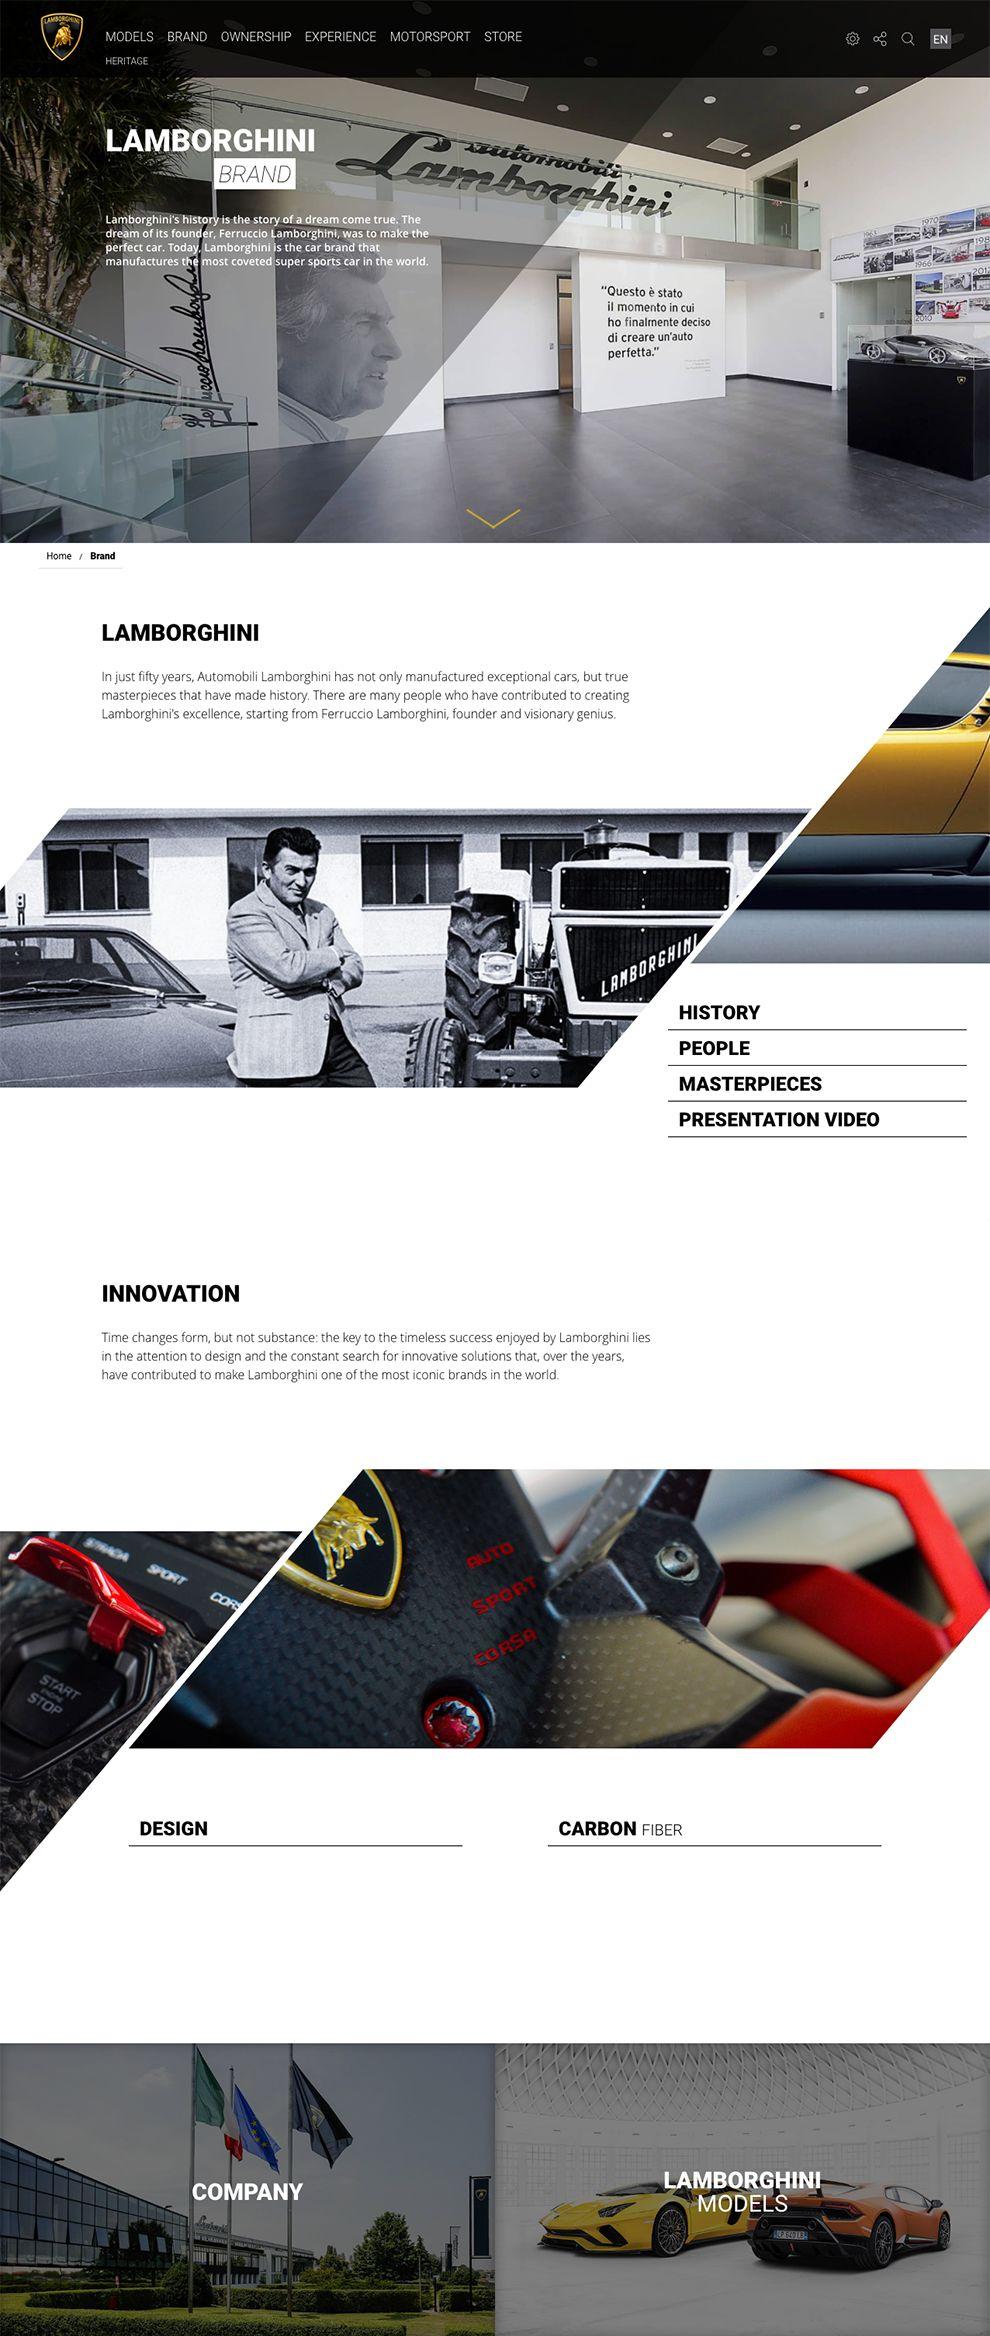 Automobili Lamborghini Elegant About Page